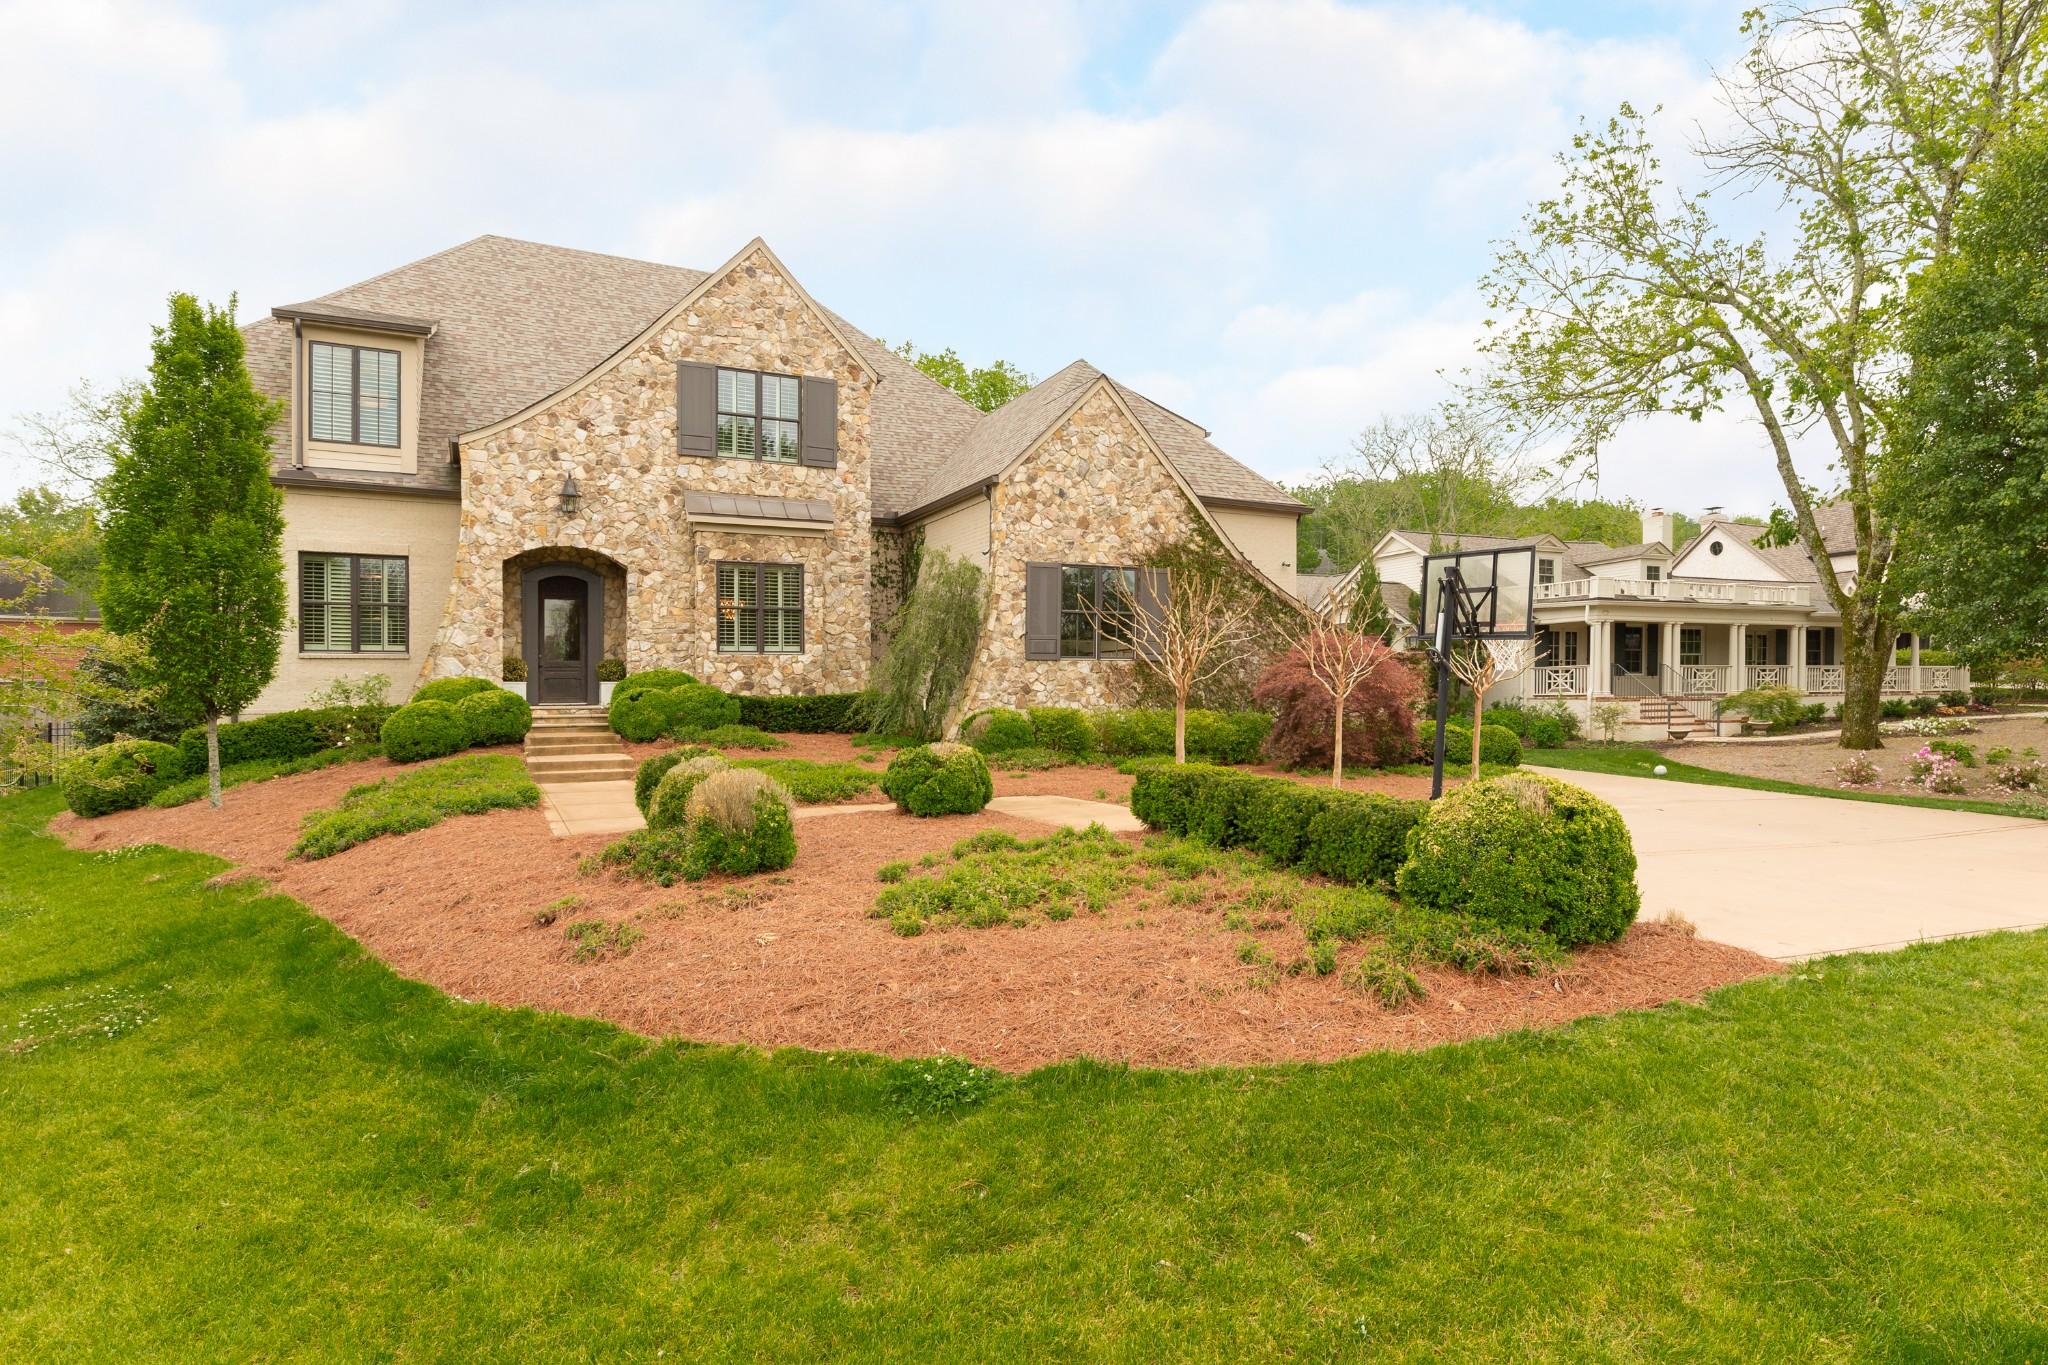 808 Lynnwood Blvd Property Photo - Nashville, TN real estate listing